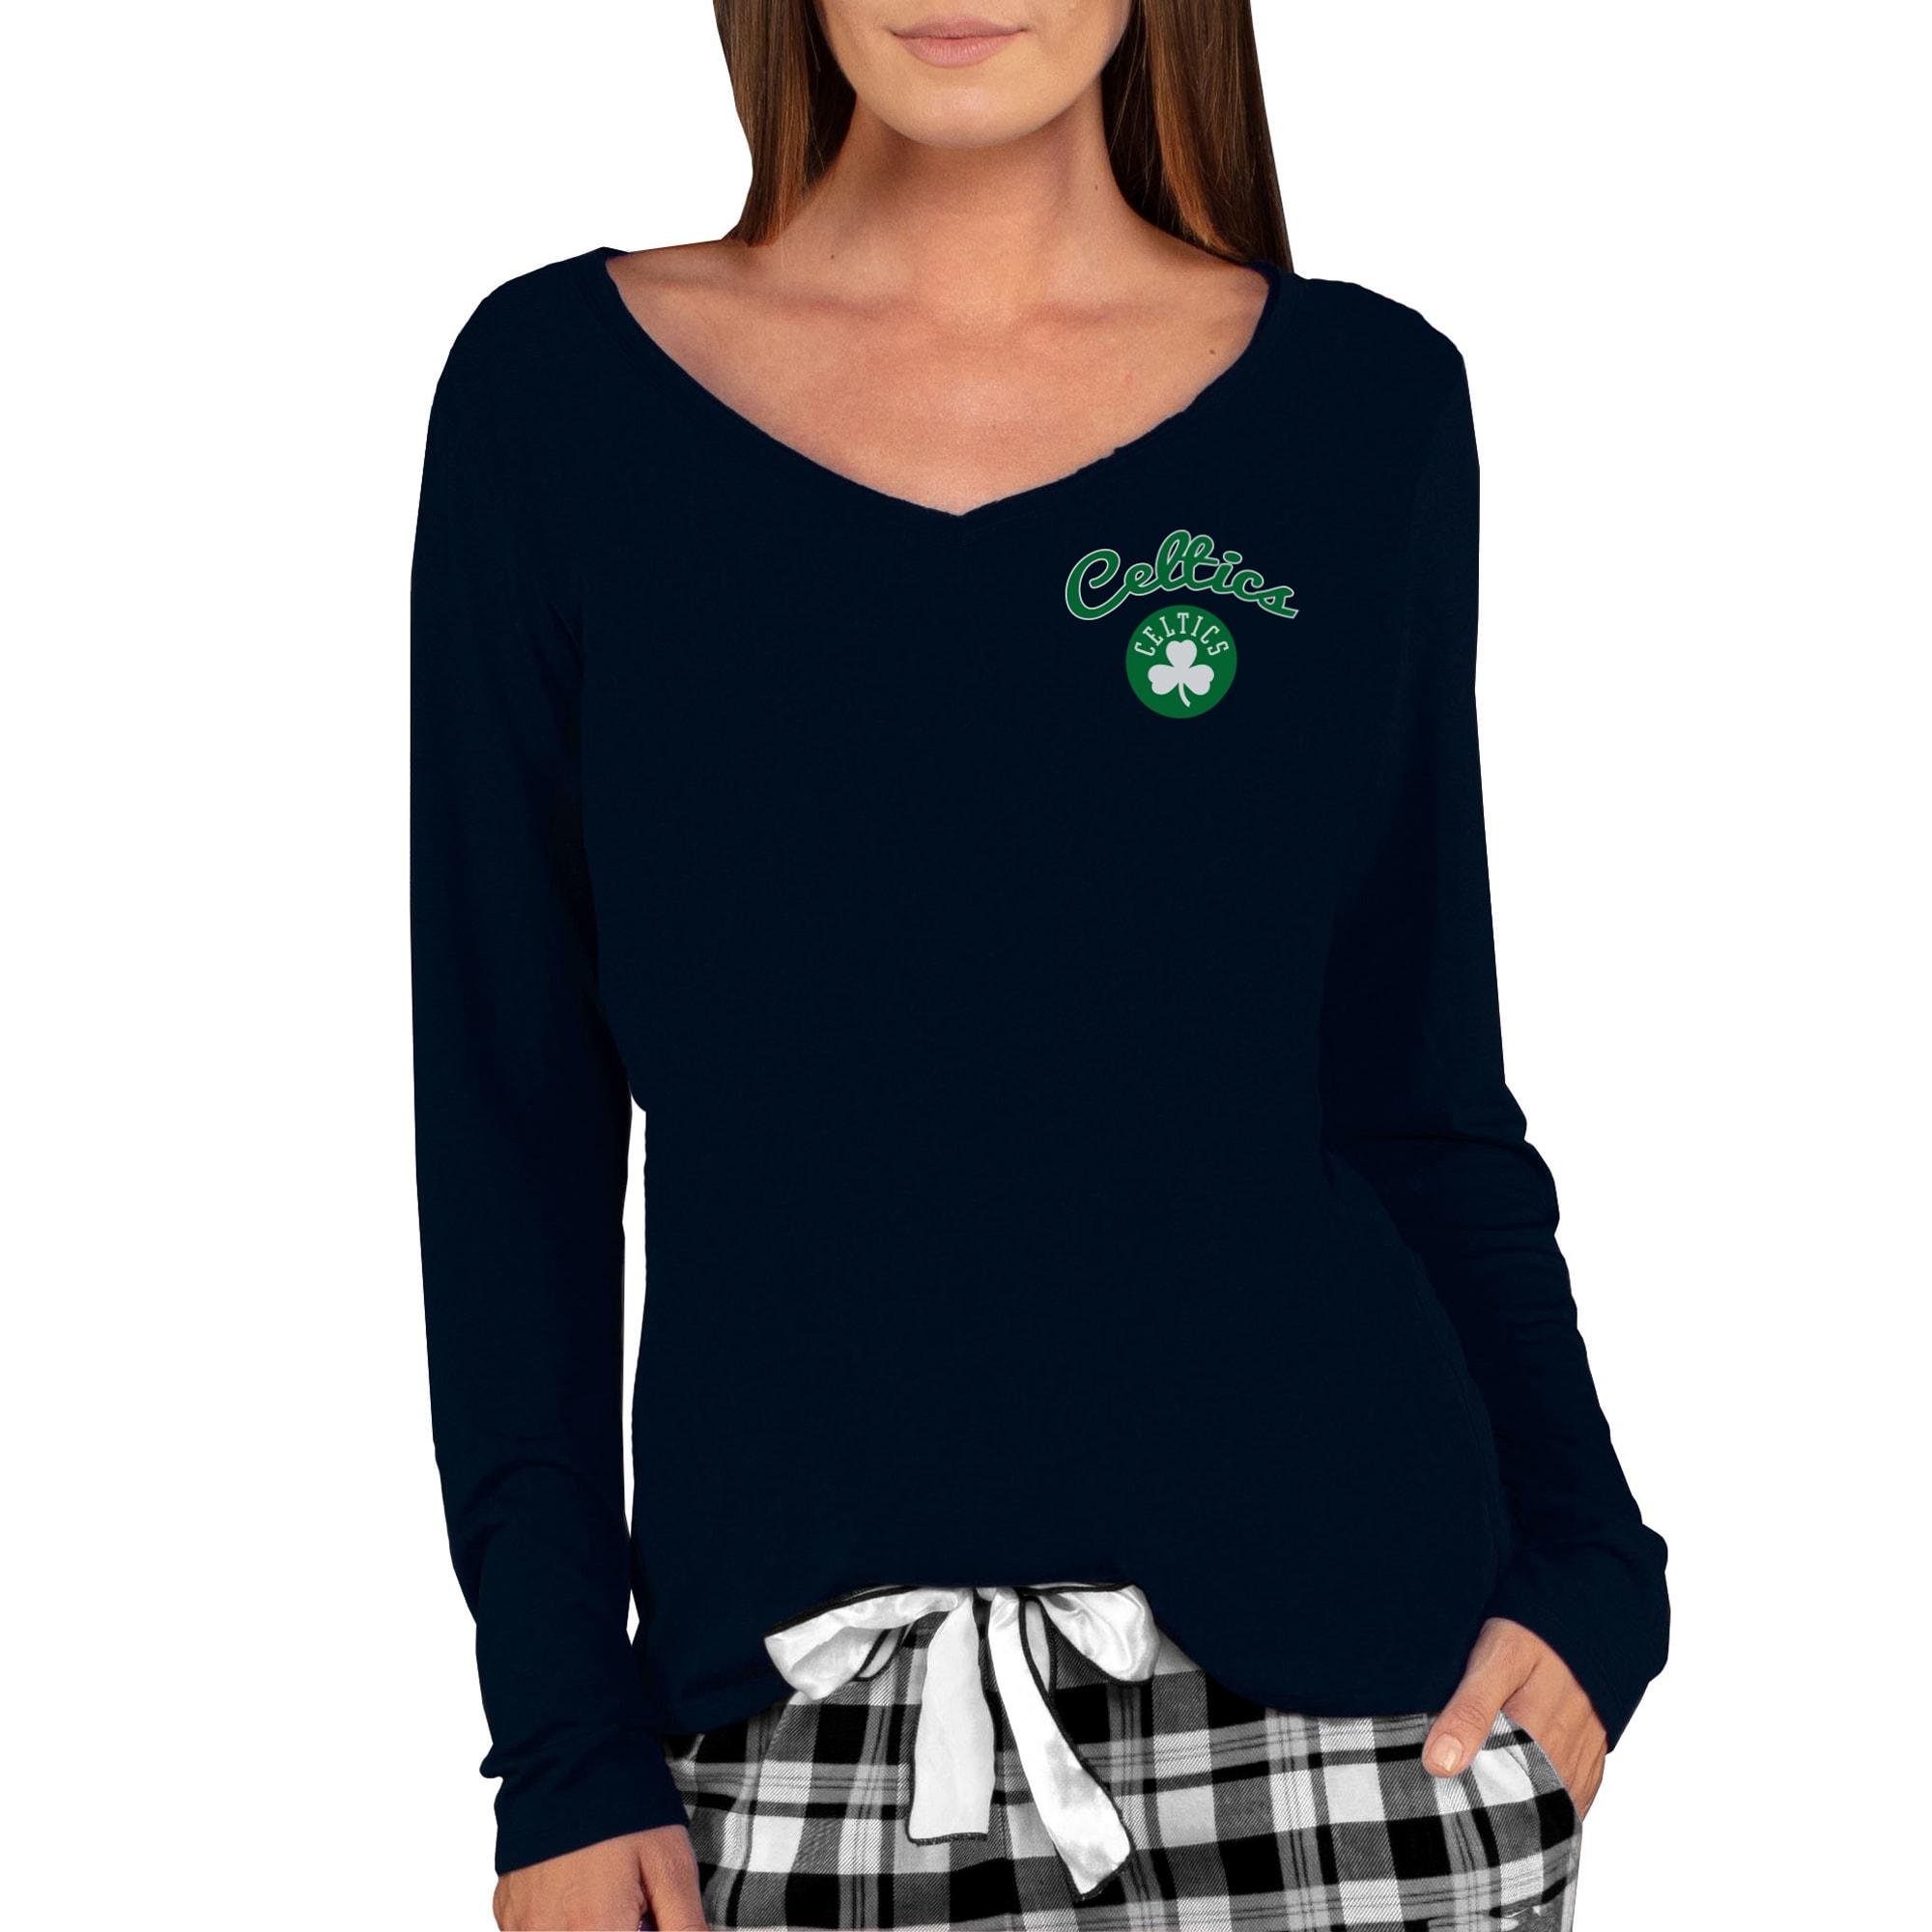 Boston Celtics Concepts Sport Women's Marathon V-Neck Long Sleeve T-Shirt - Black